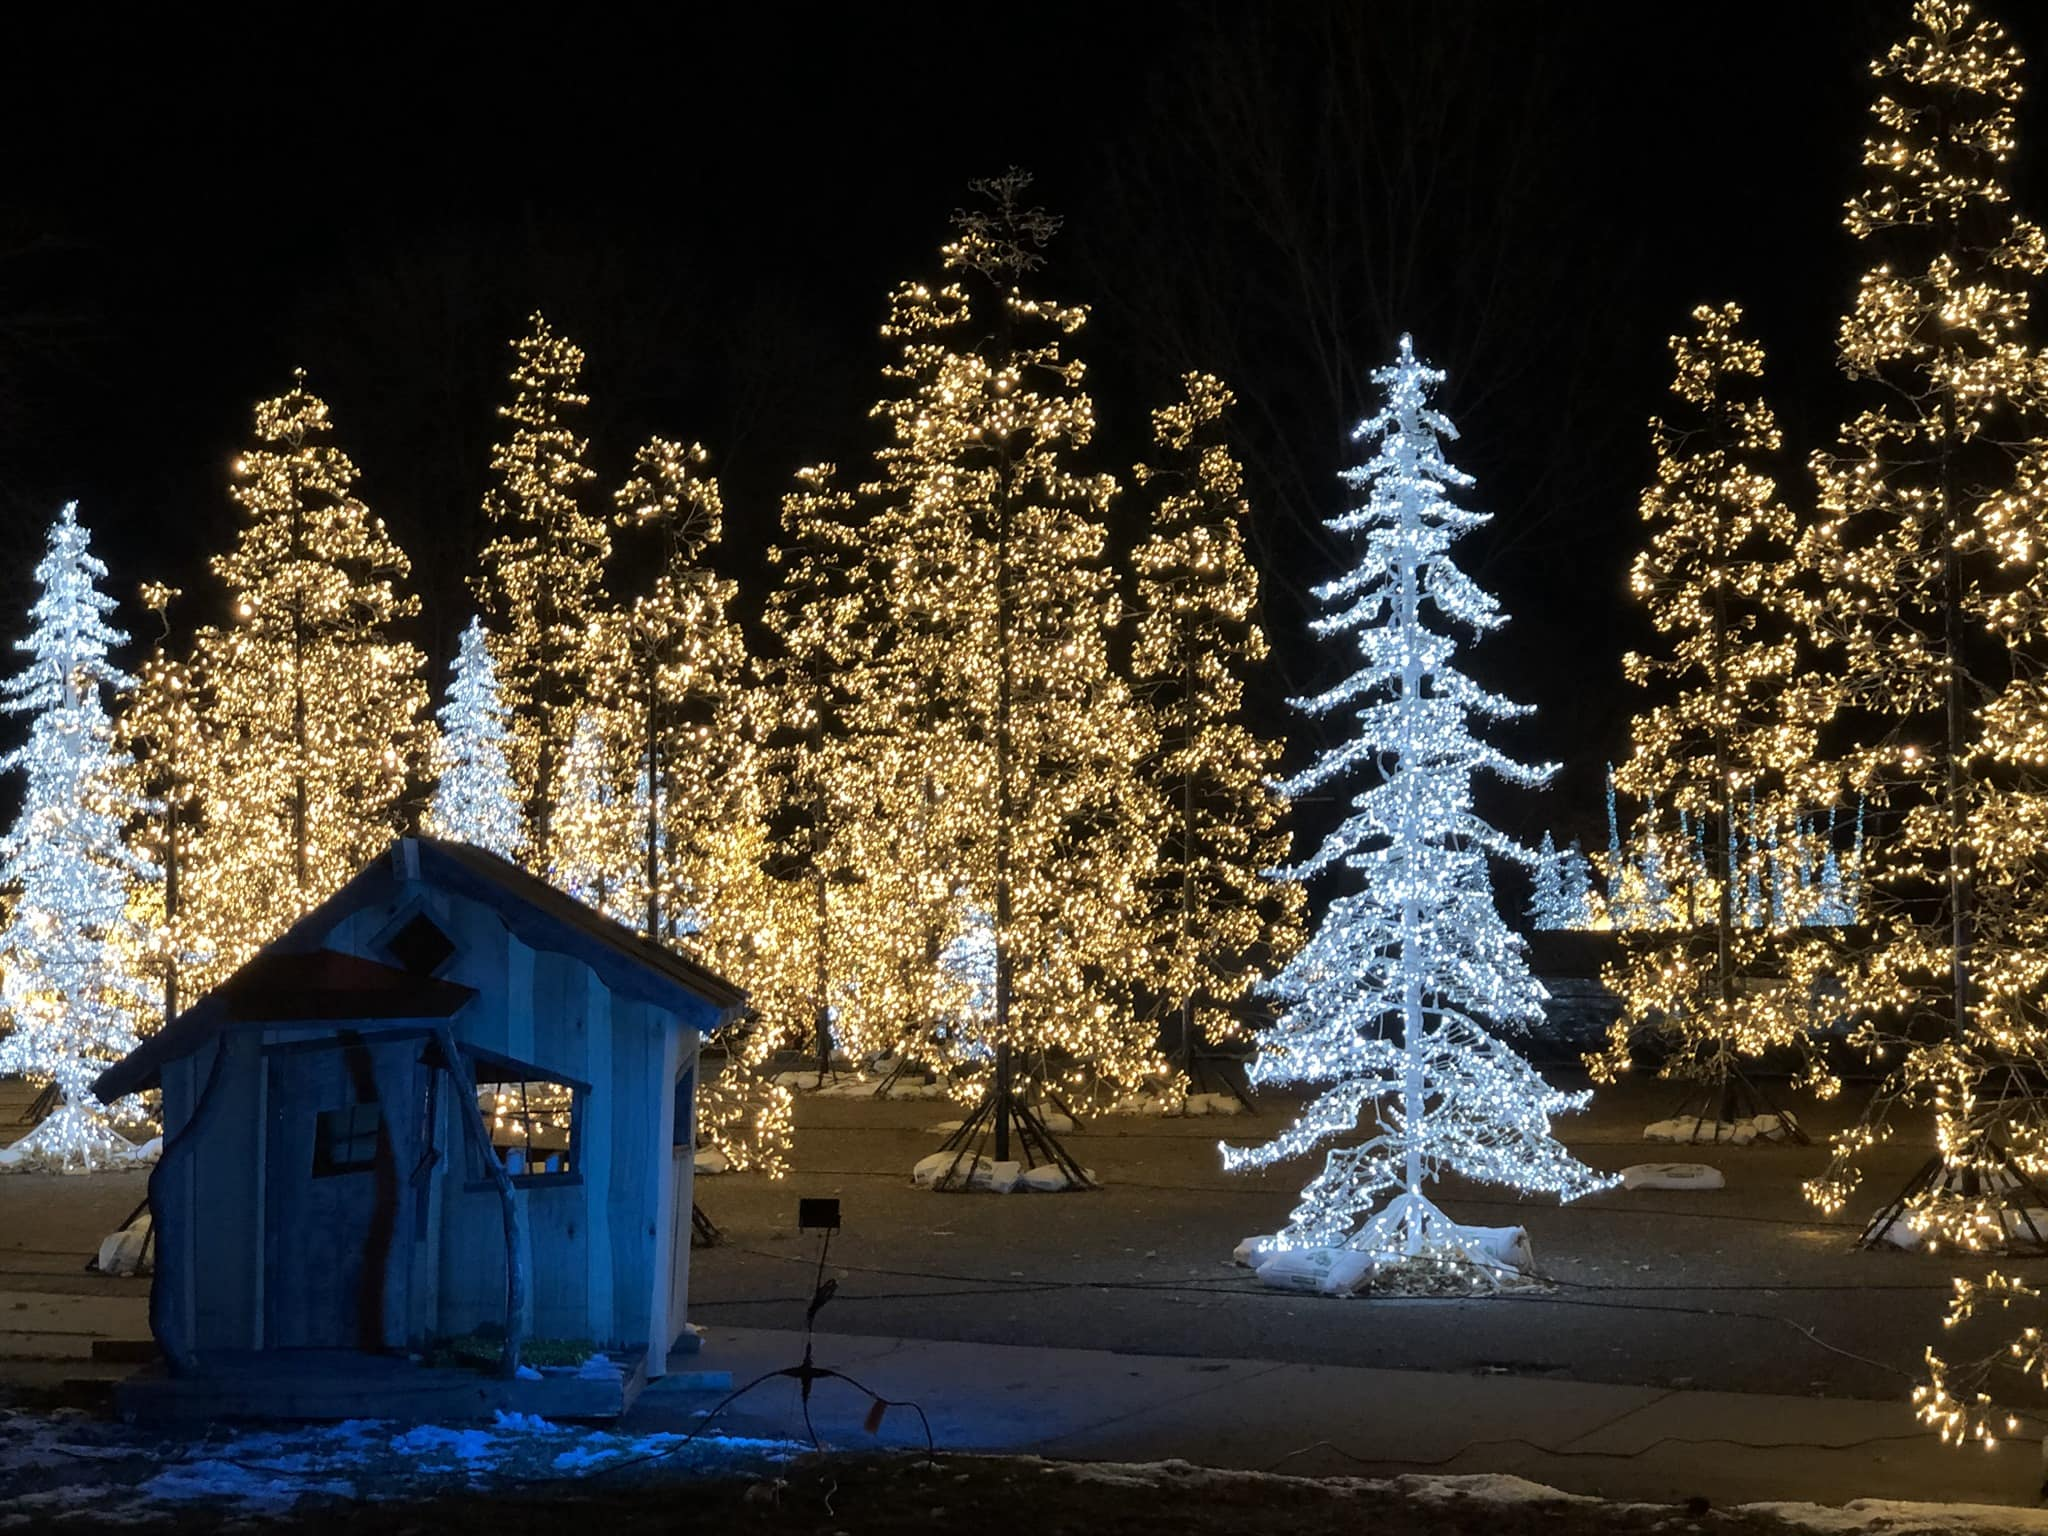 GLOW holiday festival - Christmas drive thru lights